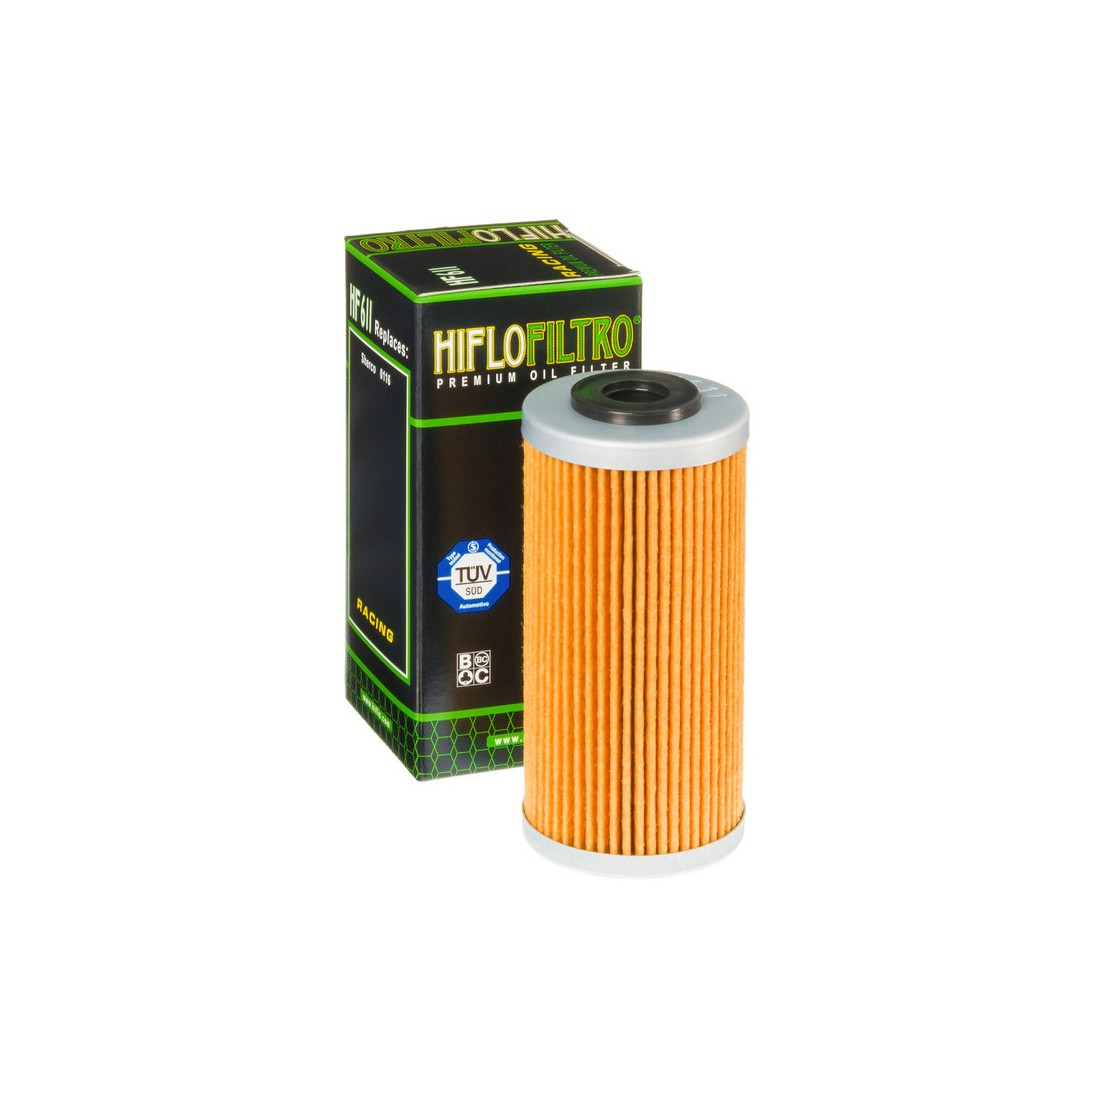 Filtro Aceite Hiflofiltro HF611